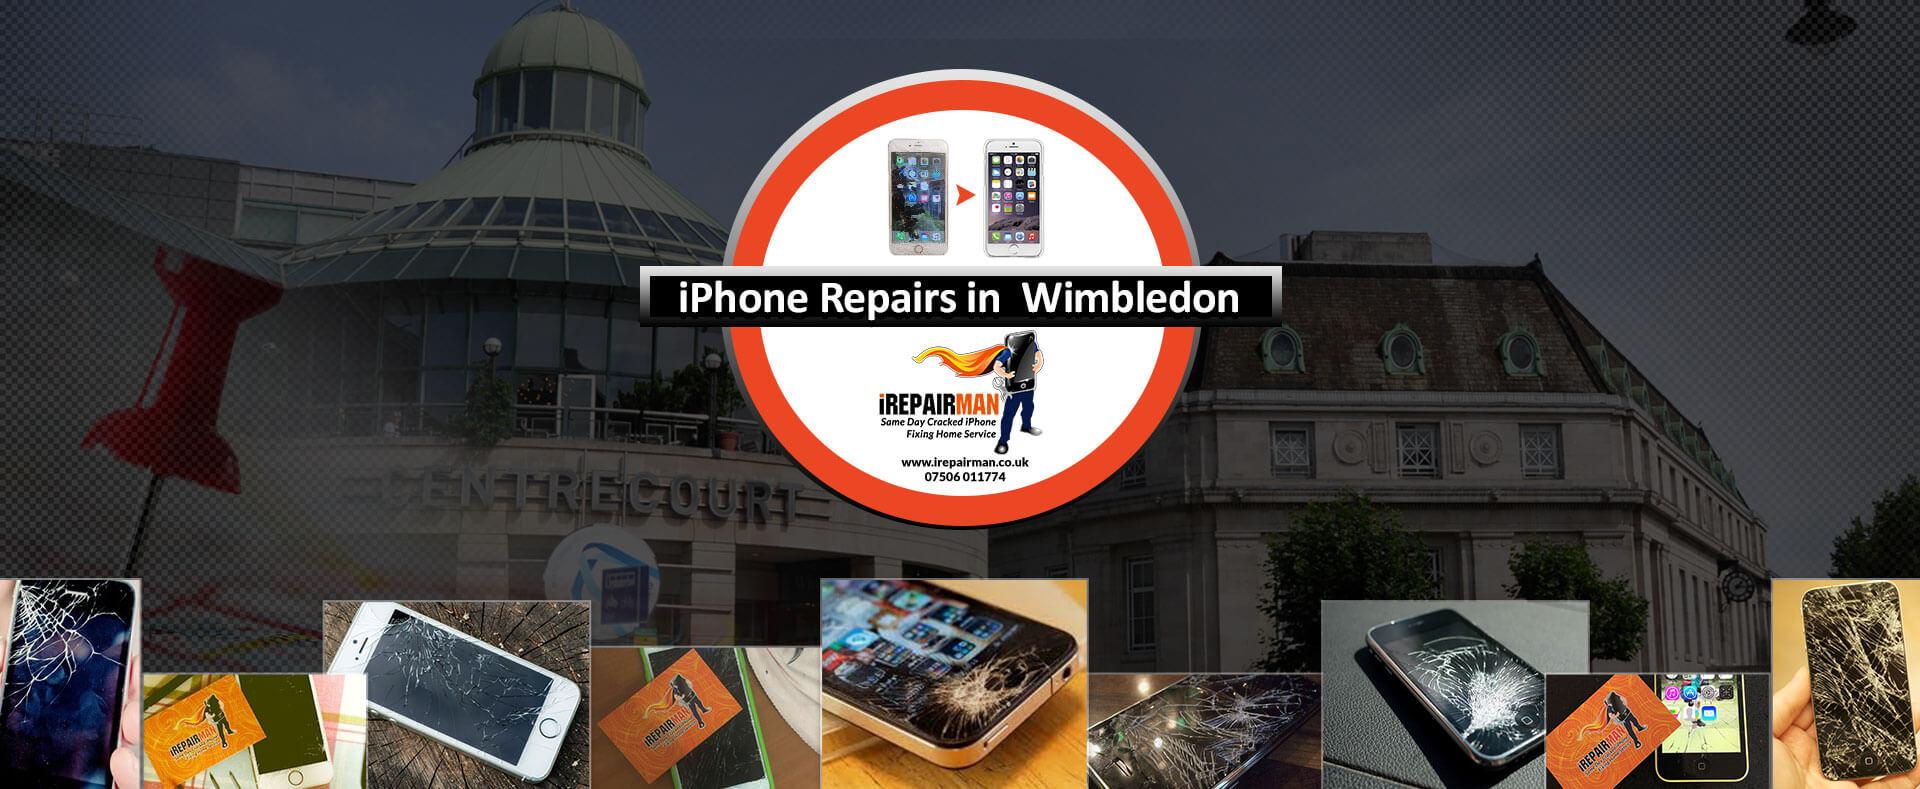 iphone-repairs-in-wimbledon